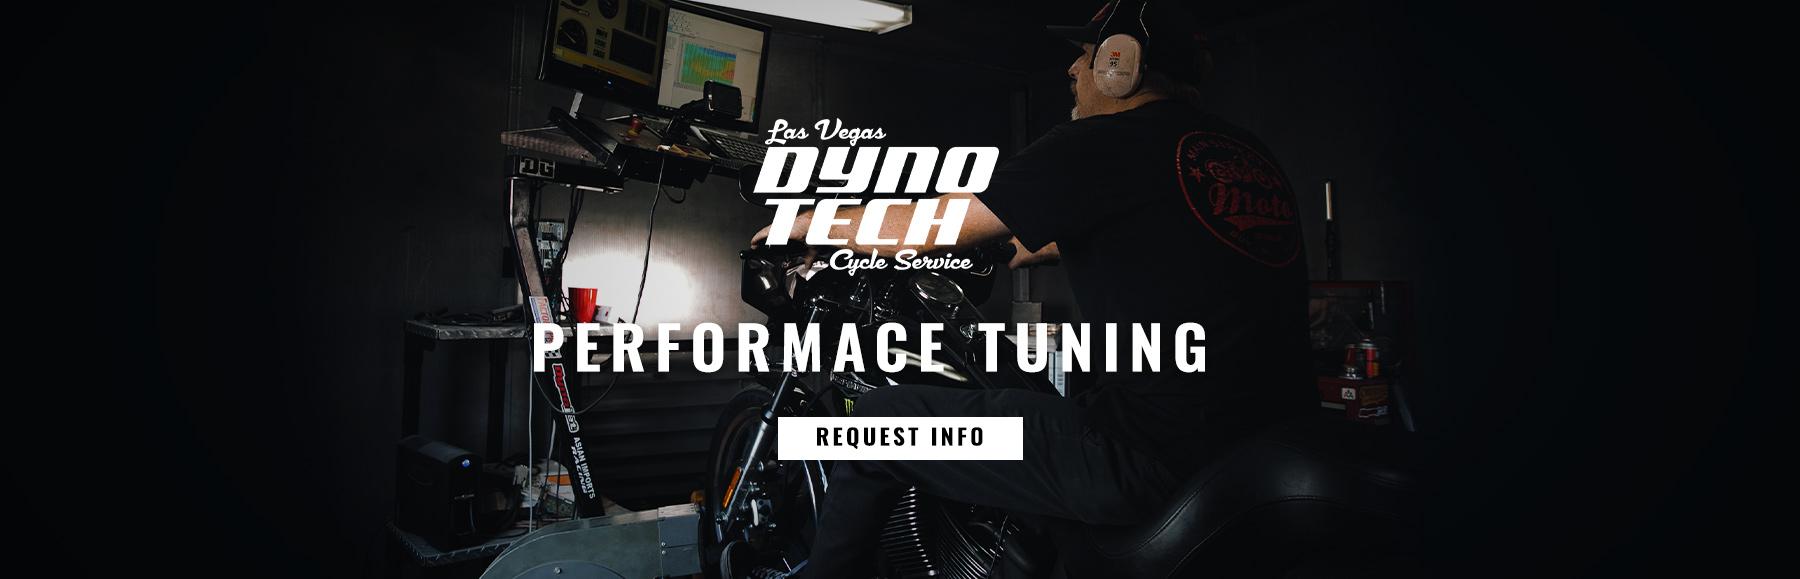 Main Street Moto | Las Vegas Dyno Tech Performace Tuning